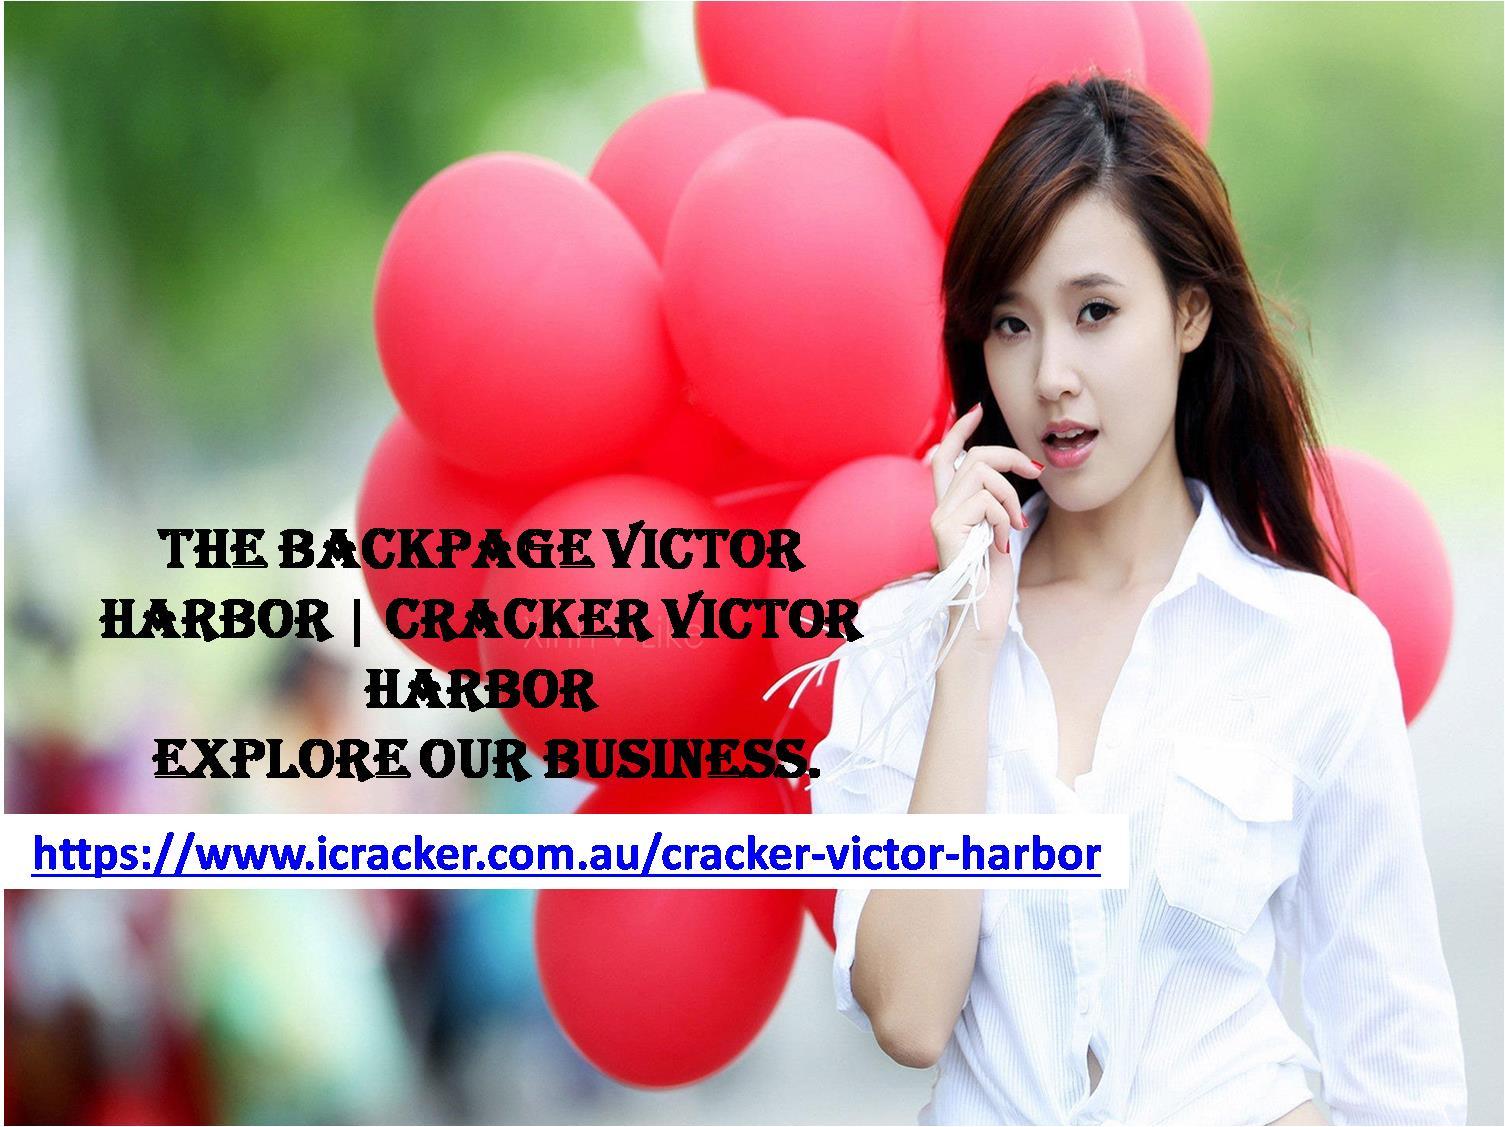 Backpage Victor Harbor | Cracker Victor Harbor